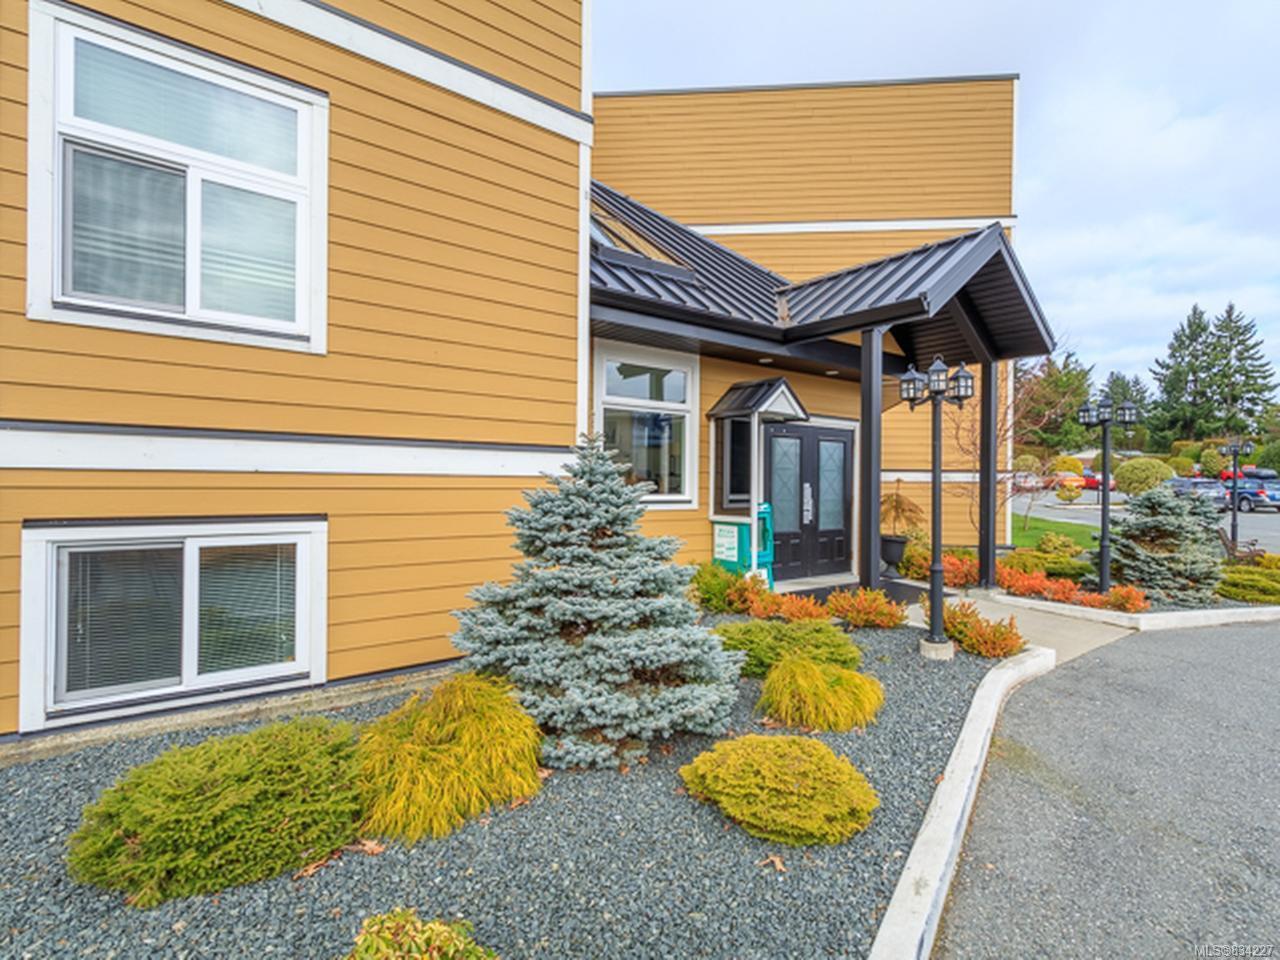 Main Photo: 304 3270 Ross Rd in NANAIMO: Na Uplands Condo for sale (Nanaimo)  : MLS®# 834227